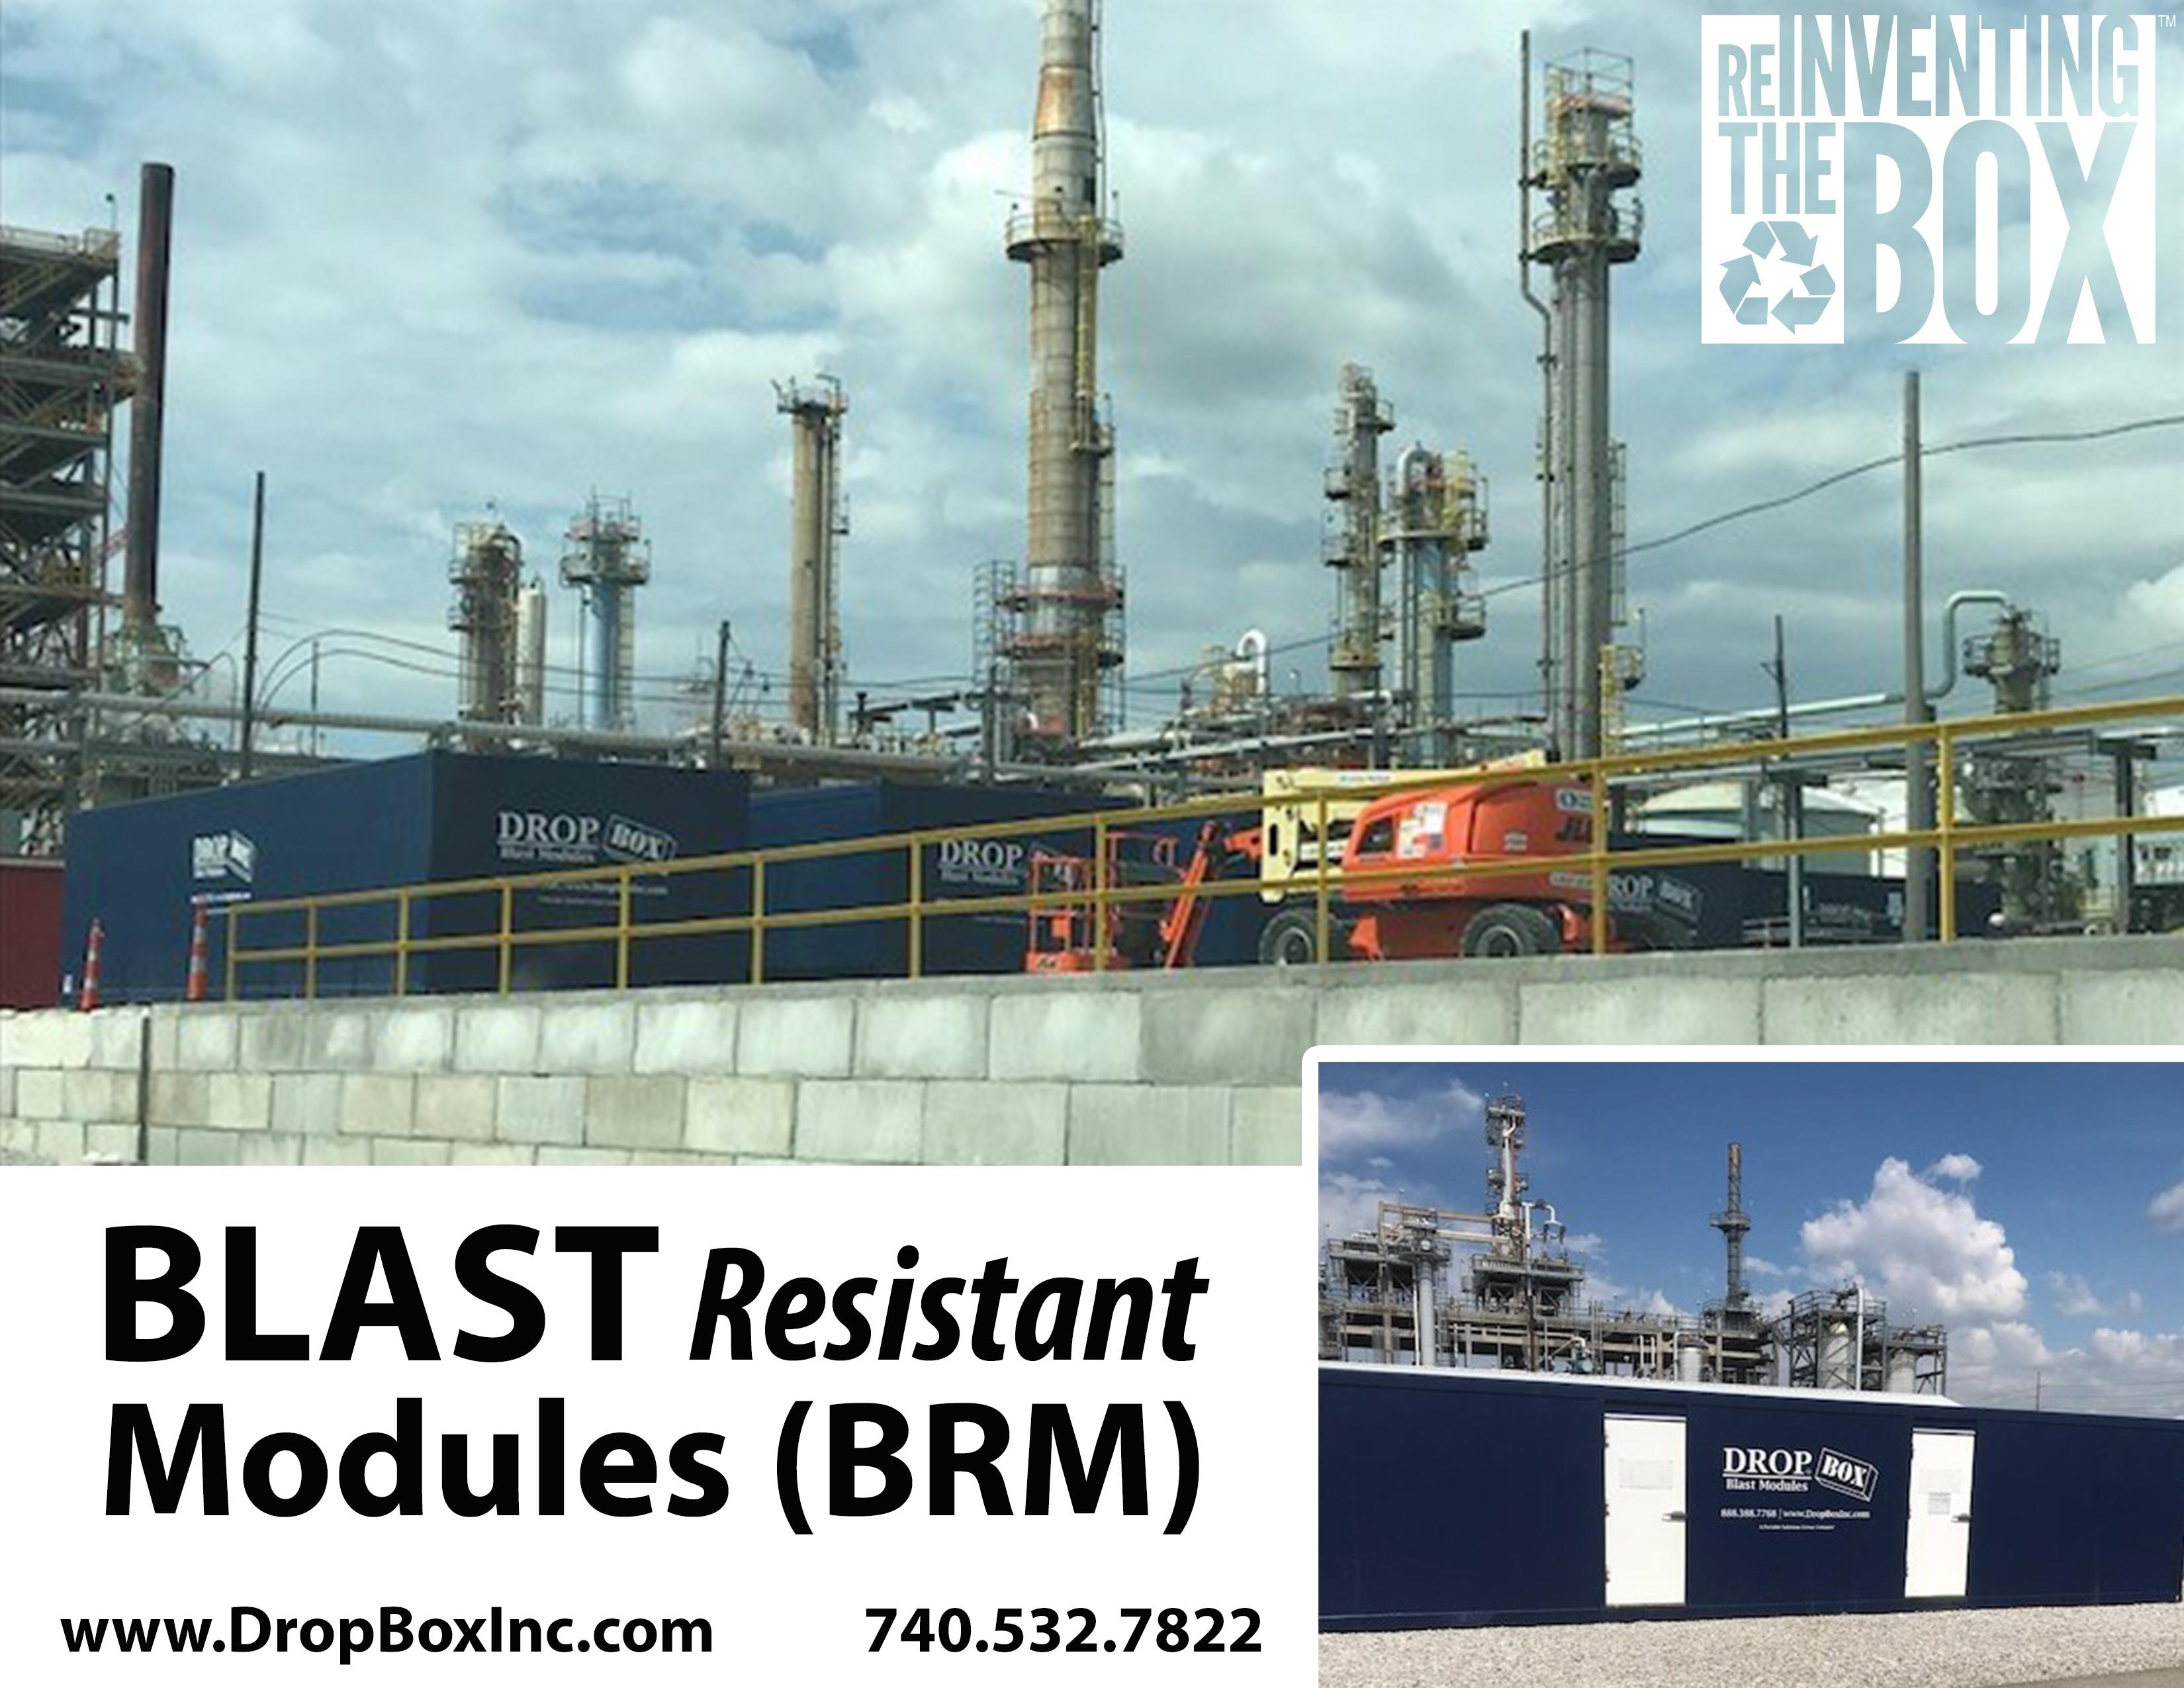 DropBox Inc, blast resistant office, BRM, custom blast resistant modules, modular blast resistant break room, blast module, blast modules, blast resistant modules